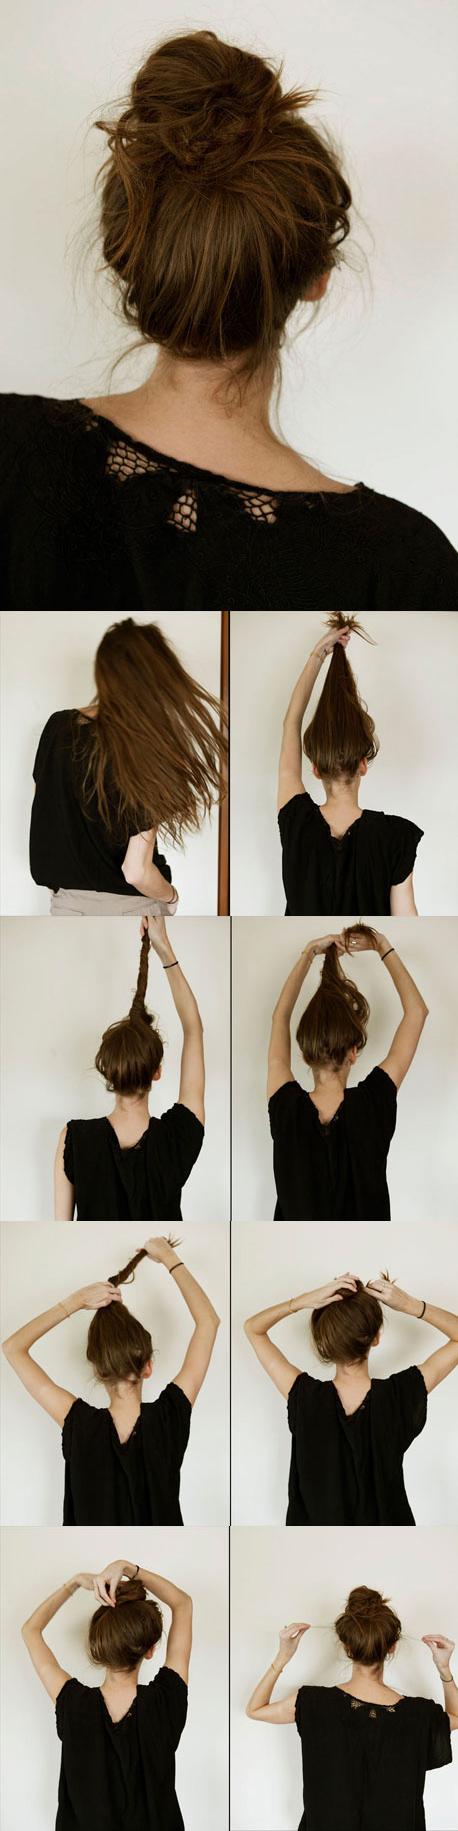 Oh-So-Simple Bun Hairstyles: Tutorials Messy Bun